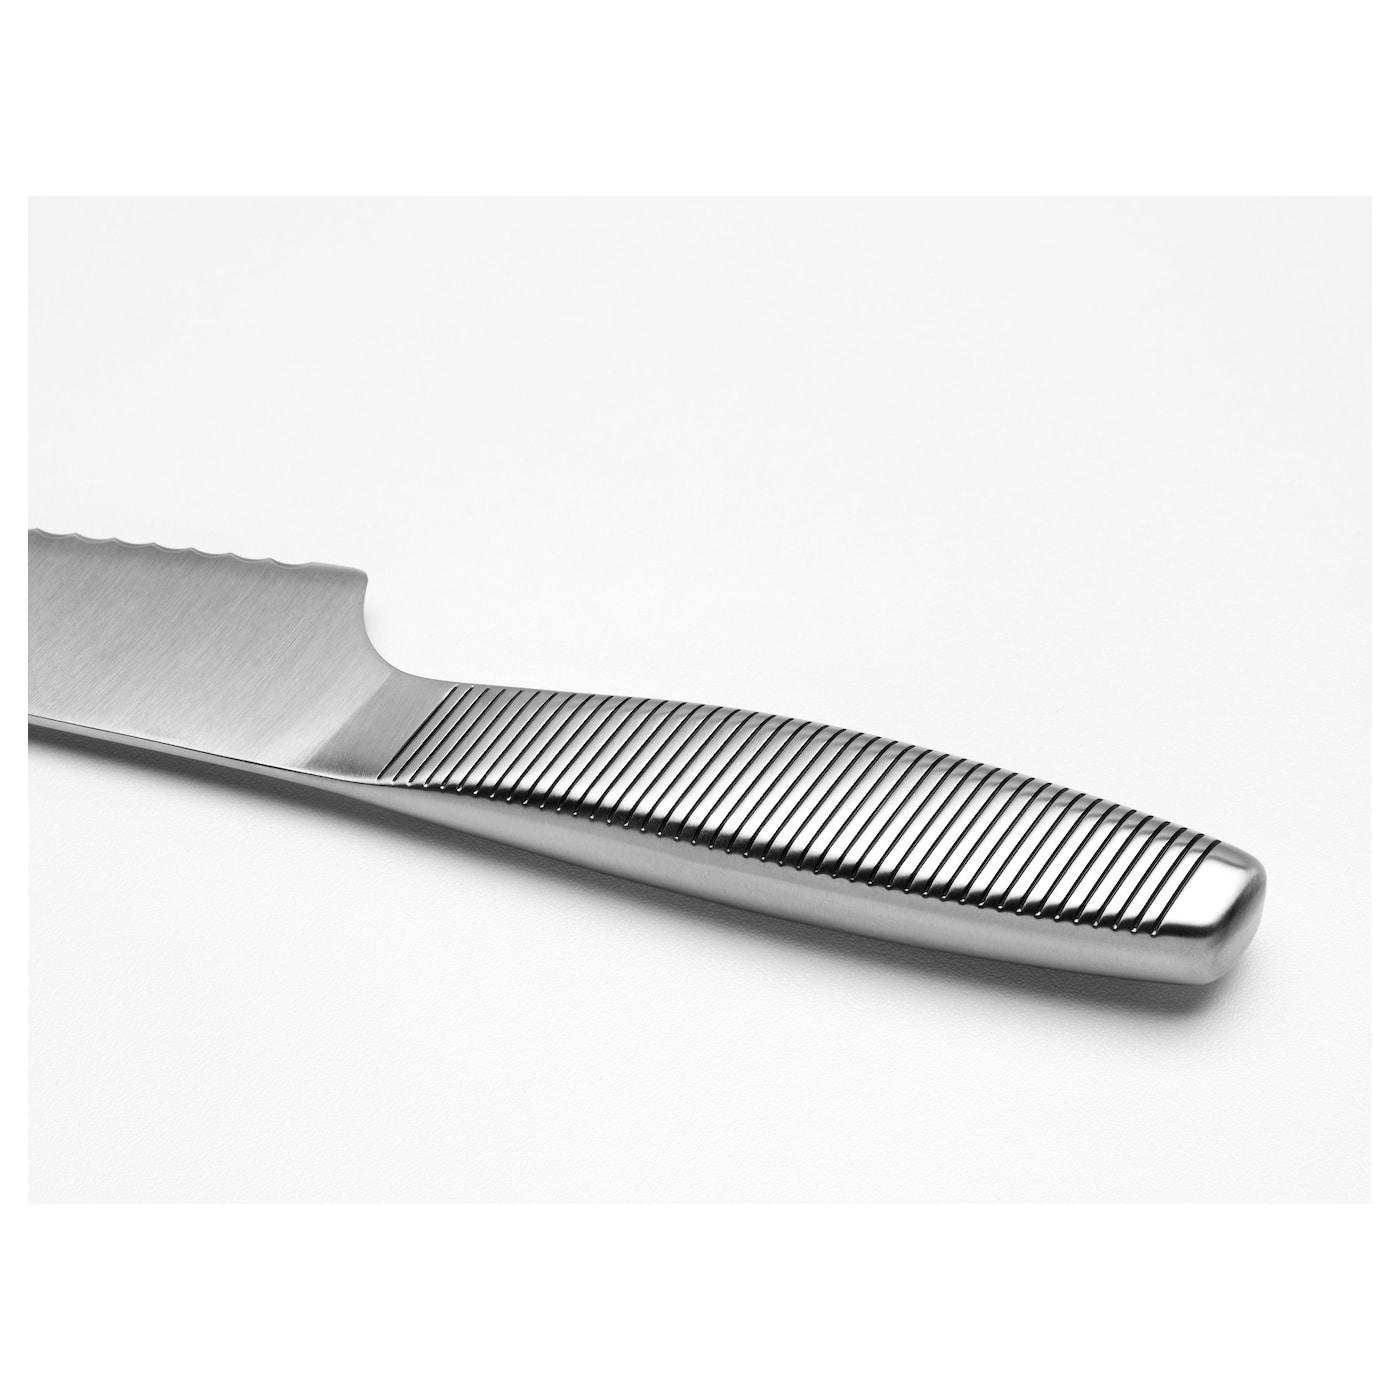 ikea 365 couteau pain acier inoxydable 23 cm ikea. Black Bedroom Furniture Sets. Home Design Ideas